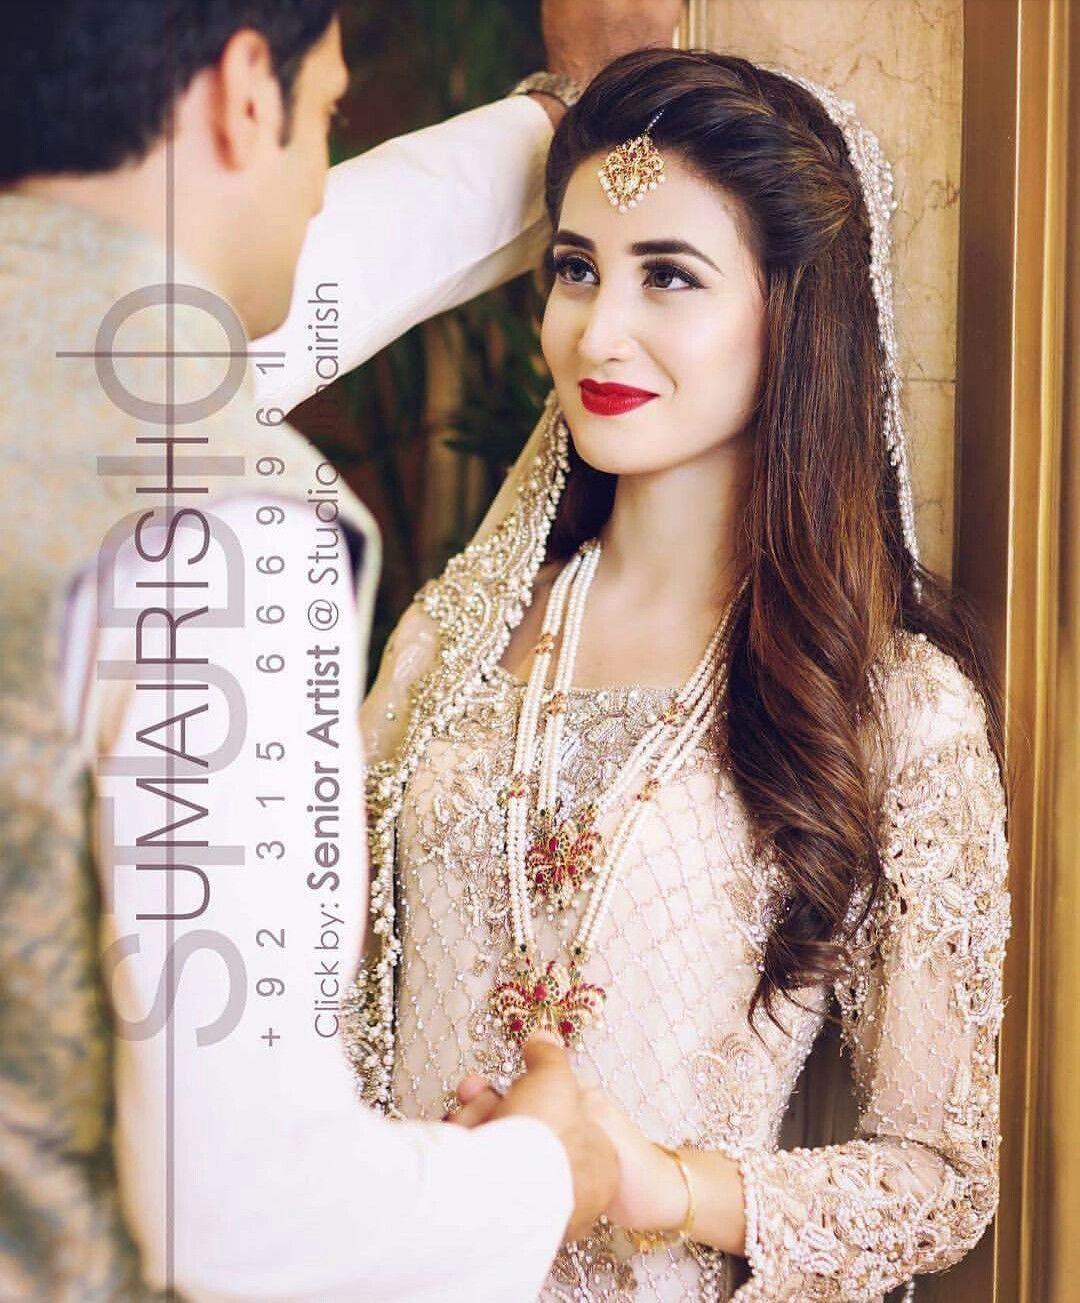 nikkah | makeup in 2019 | pakistani bridal hairstyles